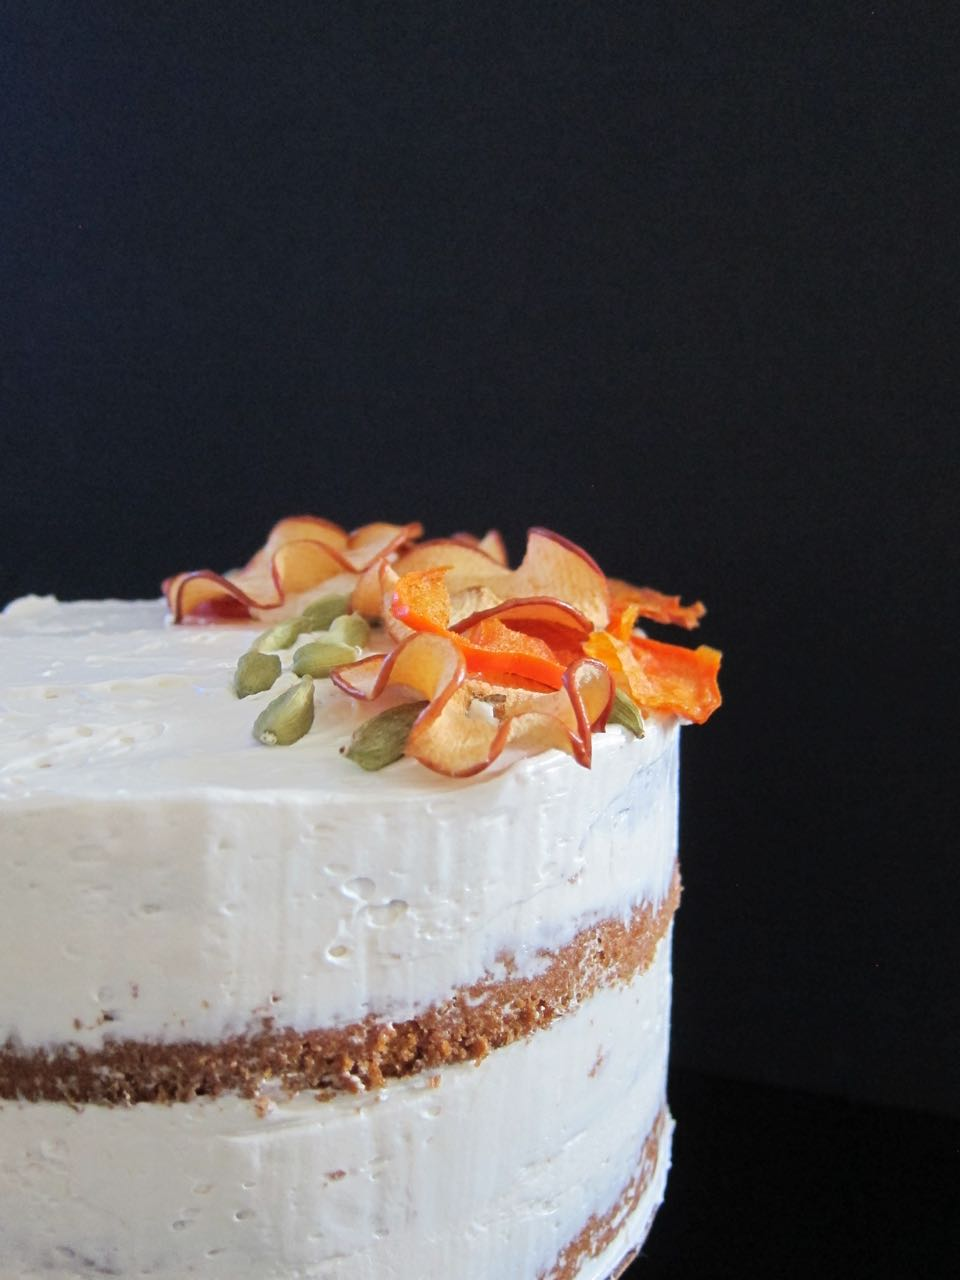 Apple & Persimmon Cake